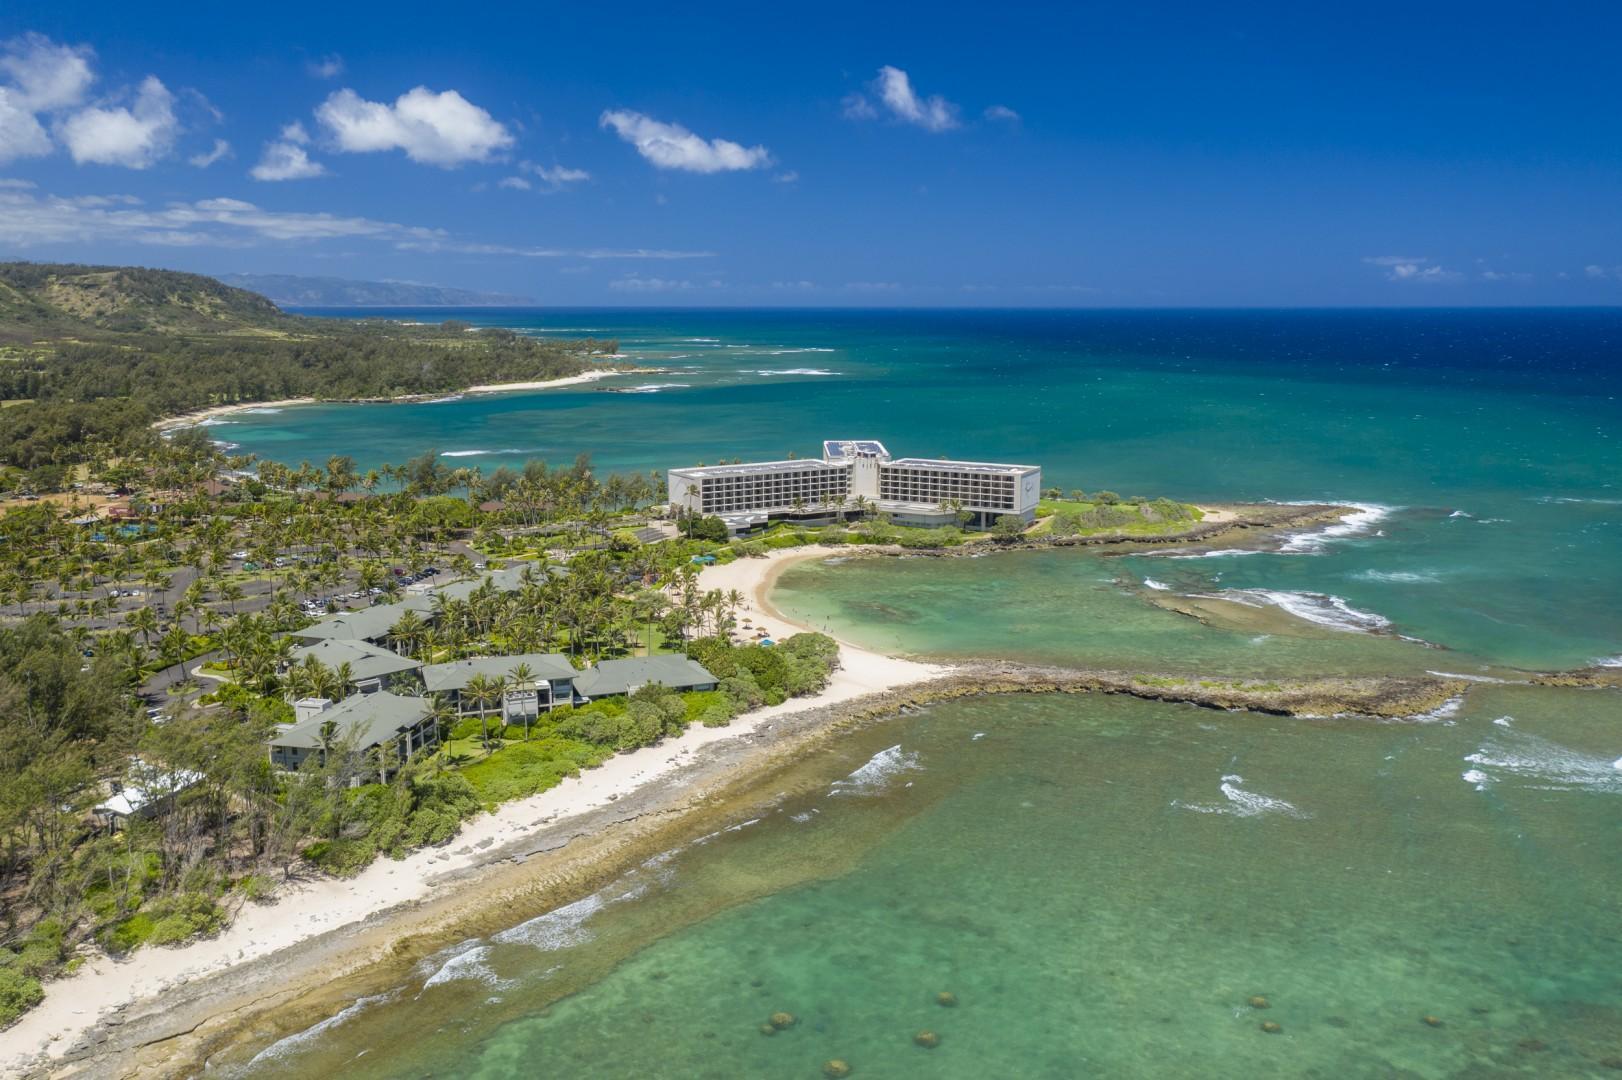 Turtle Bay Resort with surrounding beaches and bays